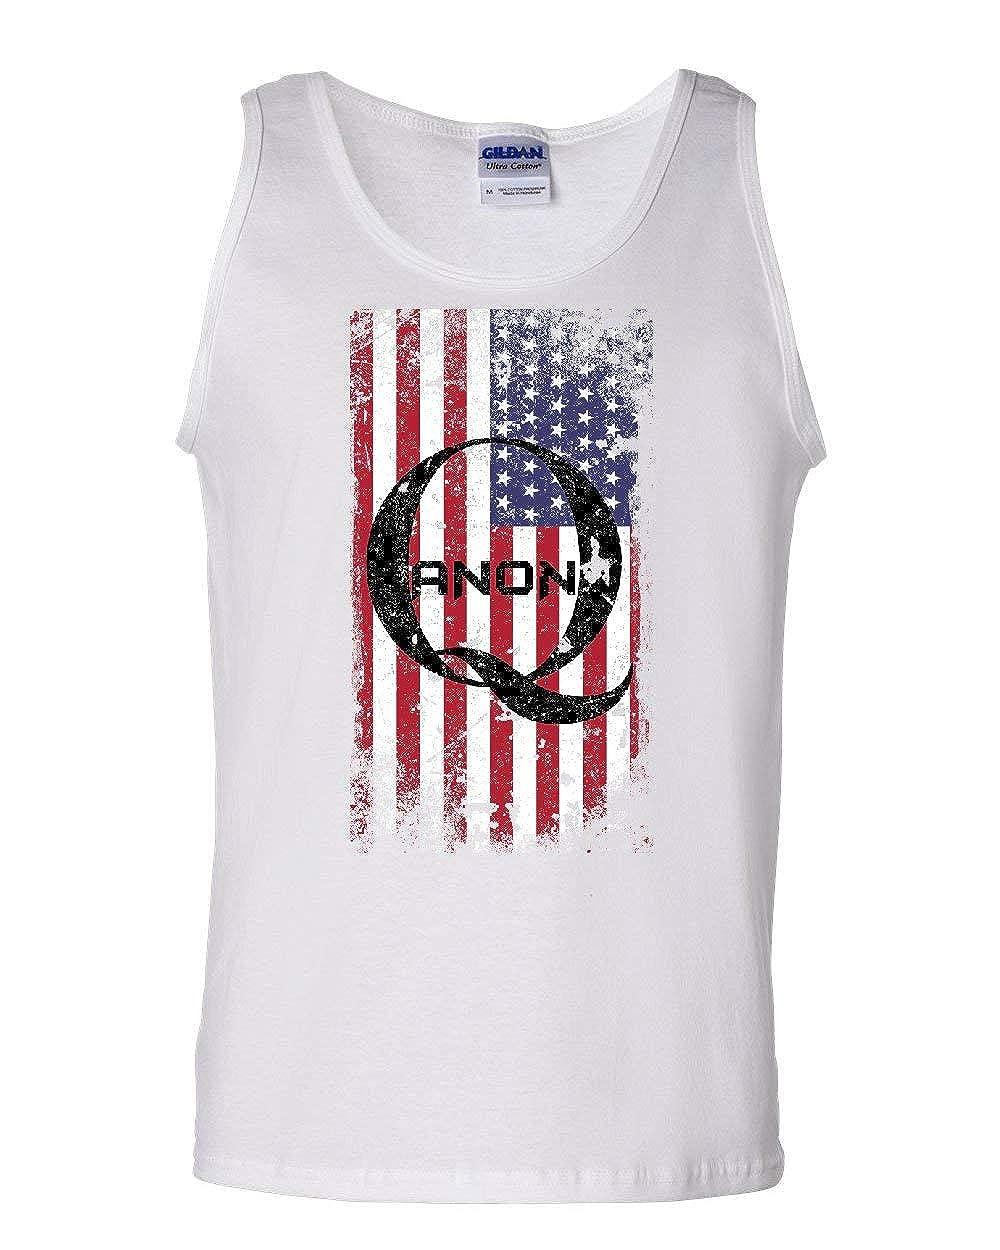 Distressed American QANON Flag Tank Top The Great Awakening USA Sleeveless